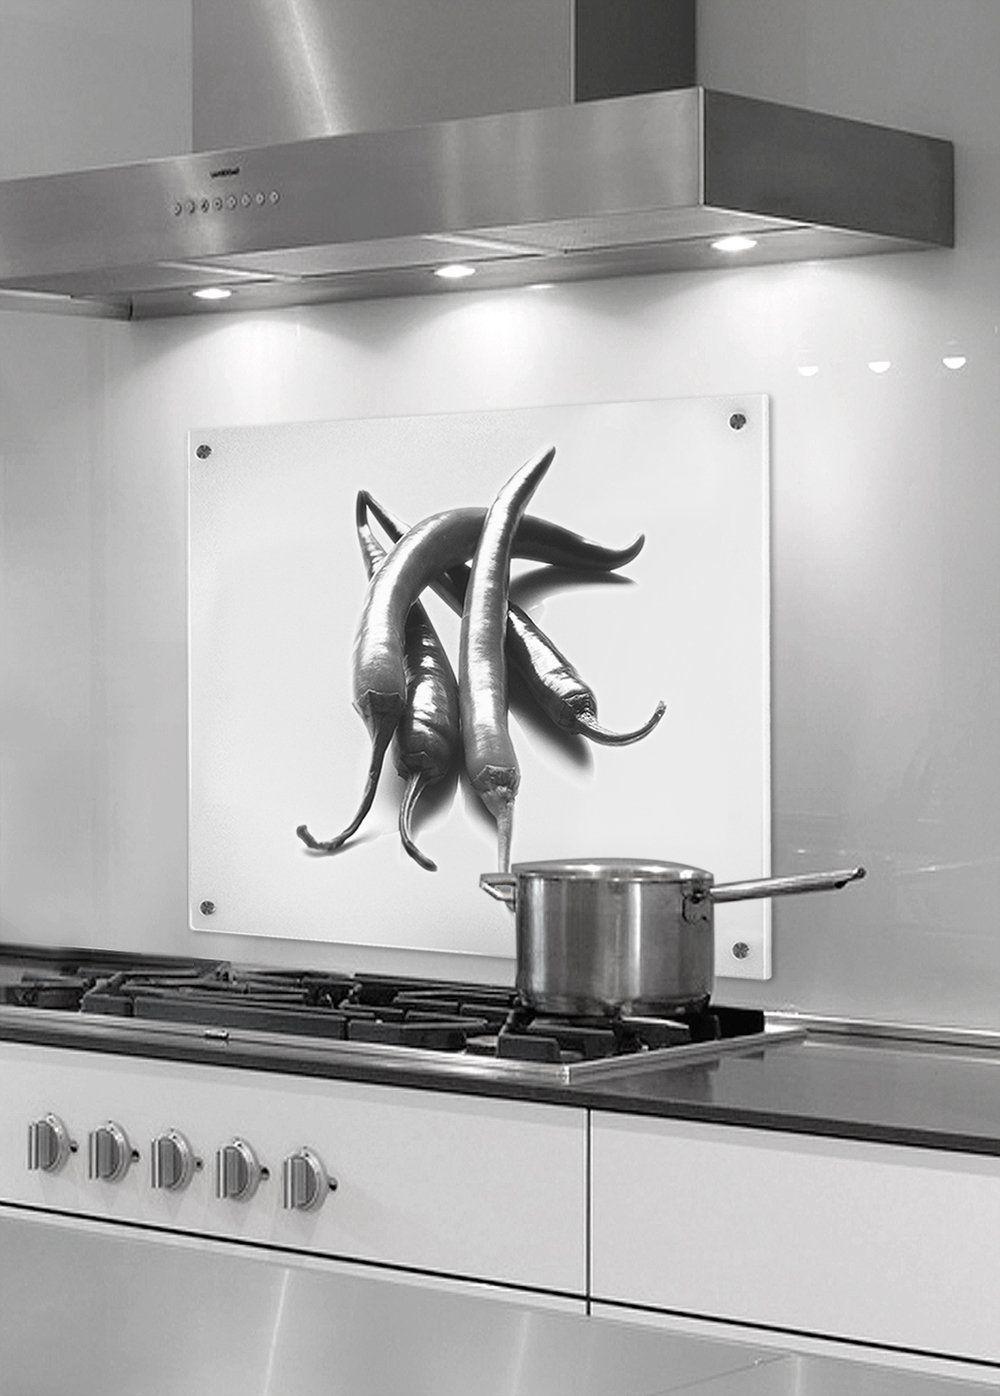 Küchenrückwand glas motiv  Amazon.de: Küchenrückwand aus Glas (ESG) - Motiv Peperoni - Format ...